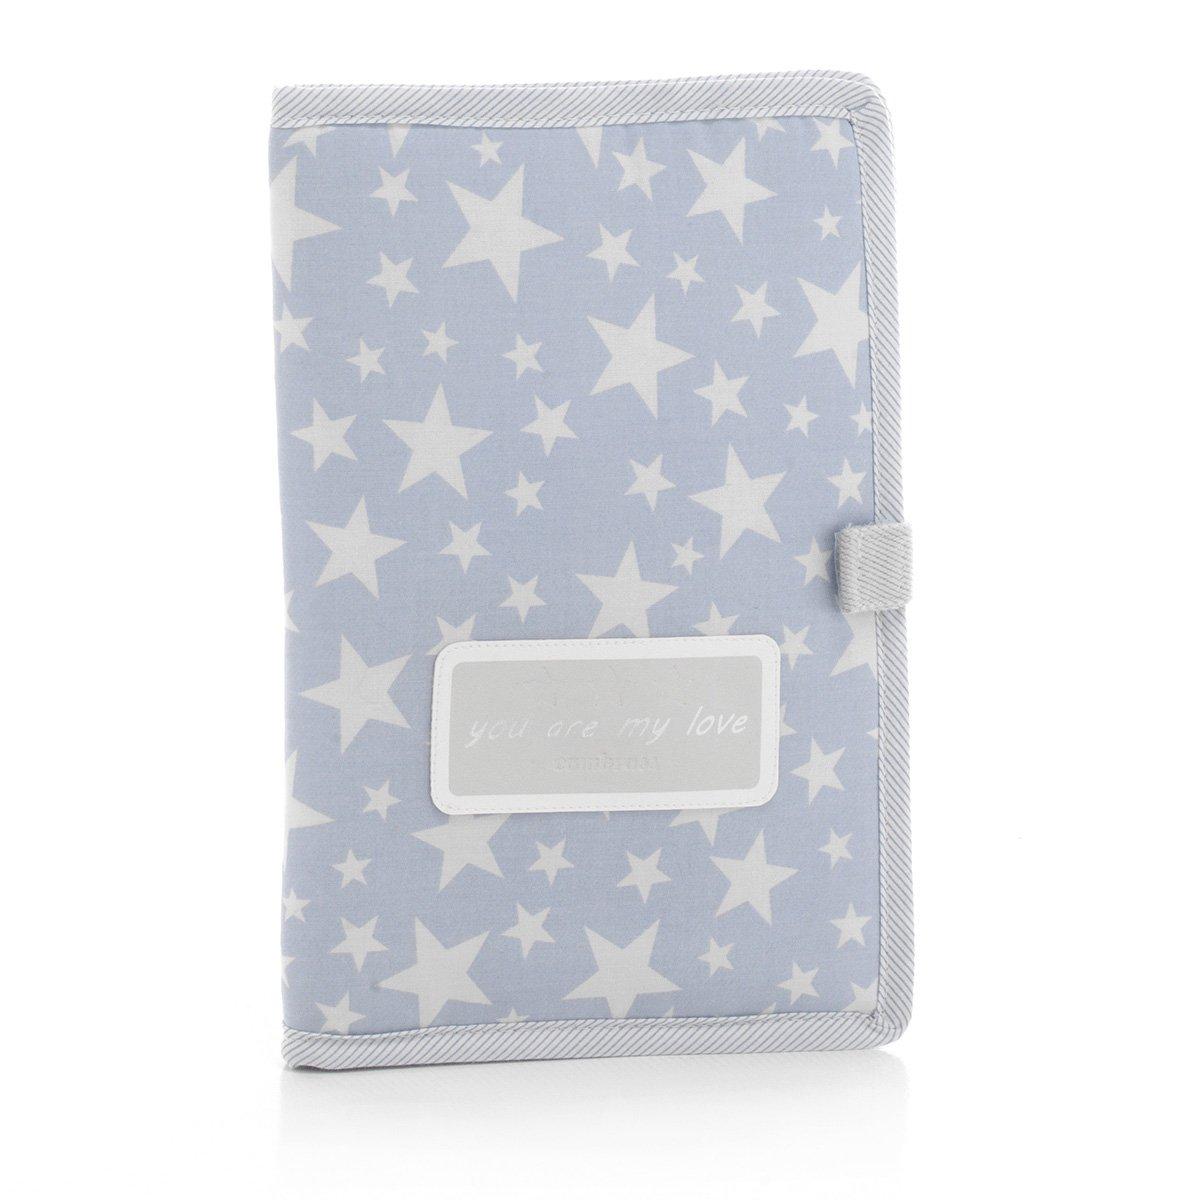 Cambrass Protège-Carnet de Santé Star Bleu 3 X 17 X 25 cm 35484.0